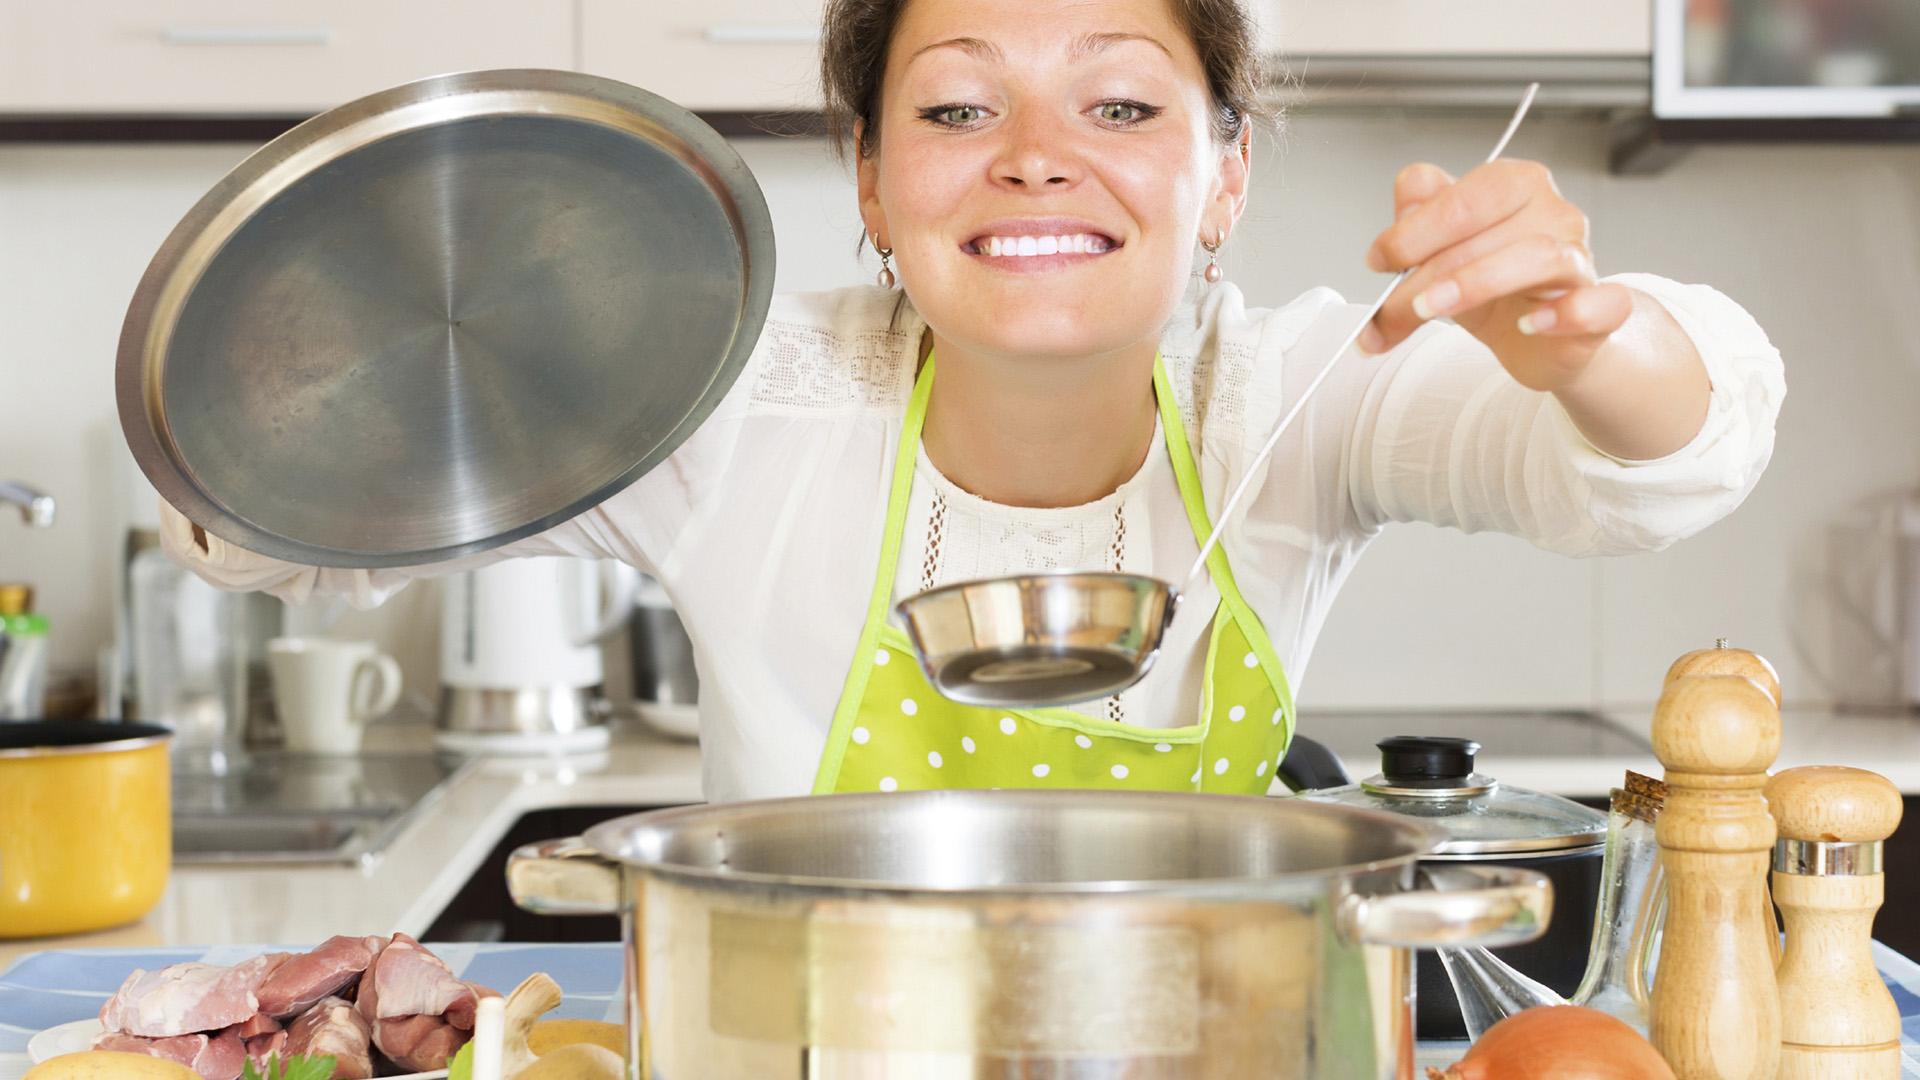 15 trucos para cocinar m s r pido telemundo for Cocinando 15 minutos con jamie